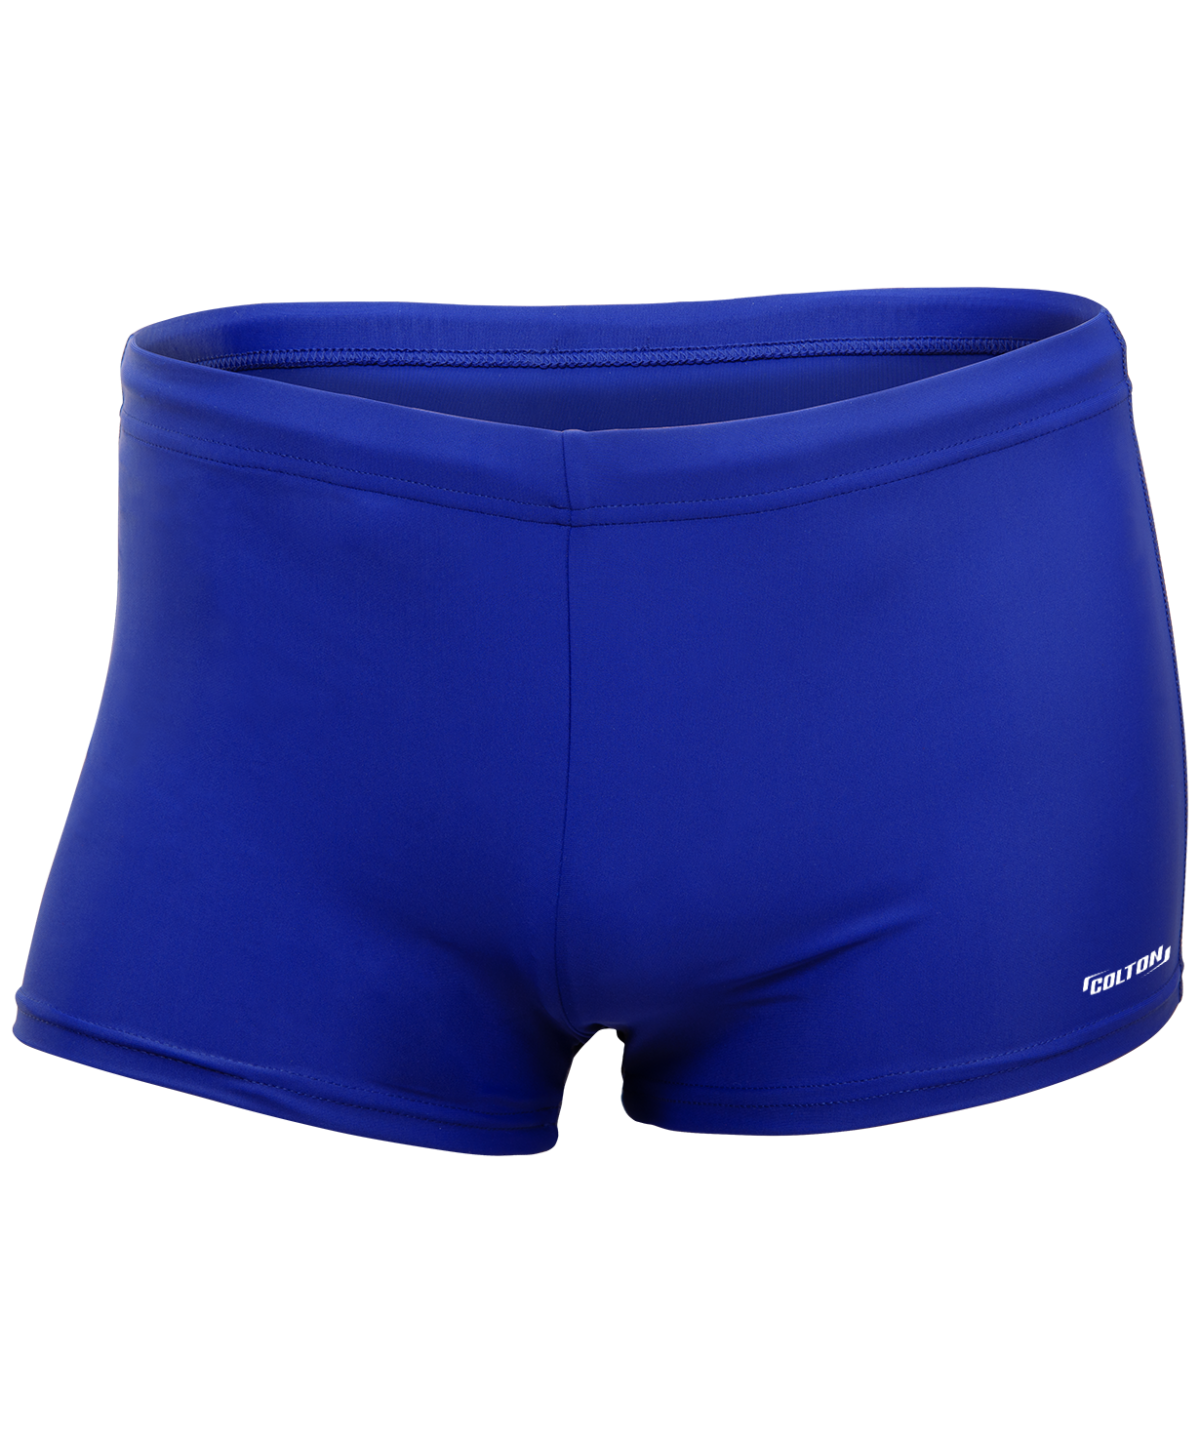 COLTON Simple Плавки-шорты детские (36-42)  SS-2984: синий - 1